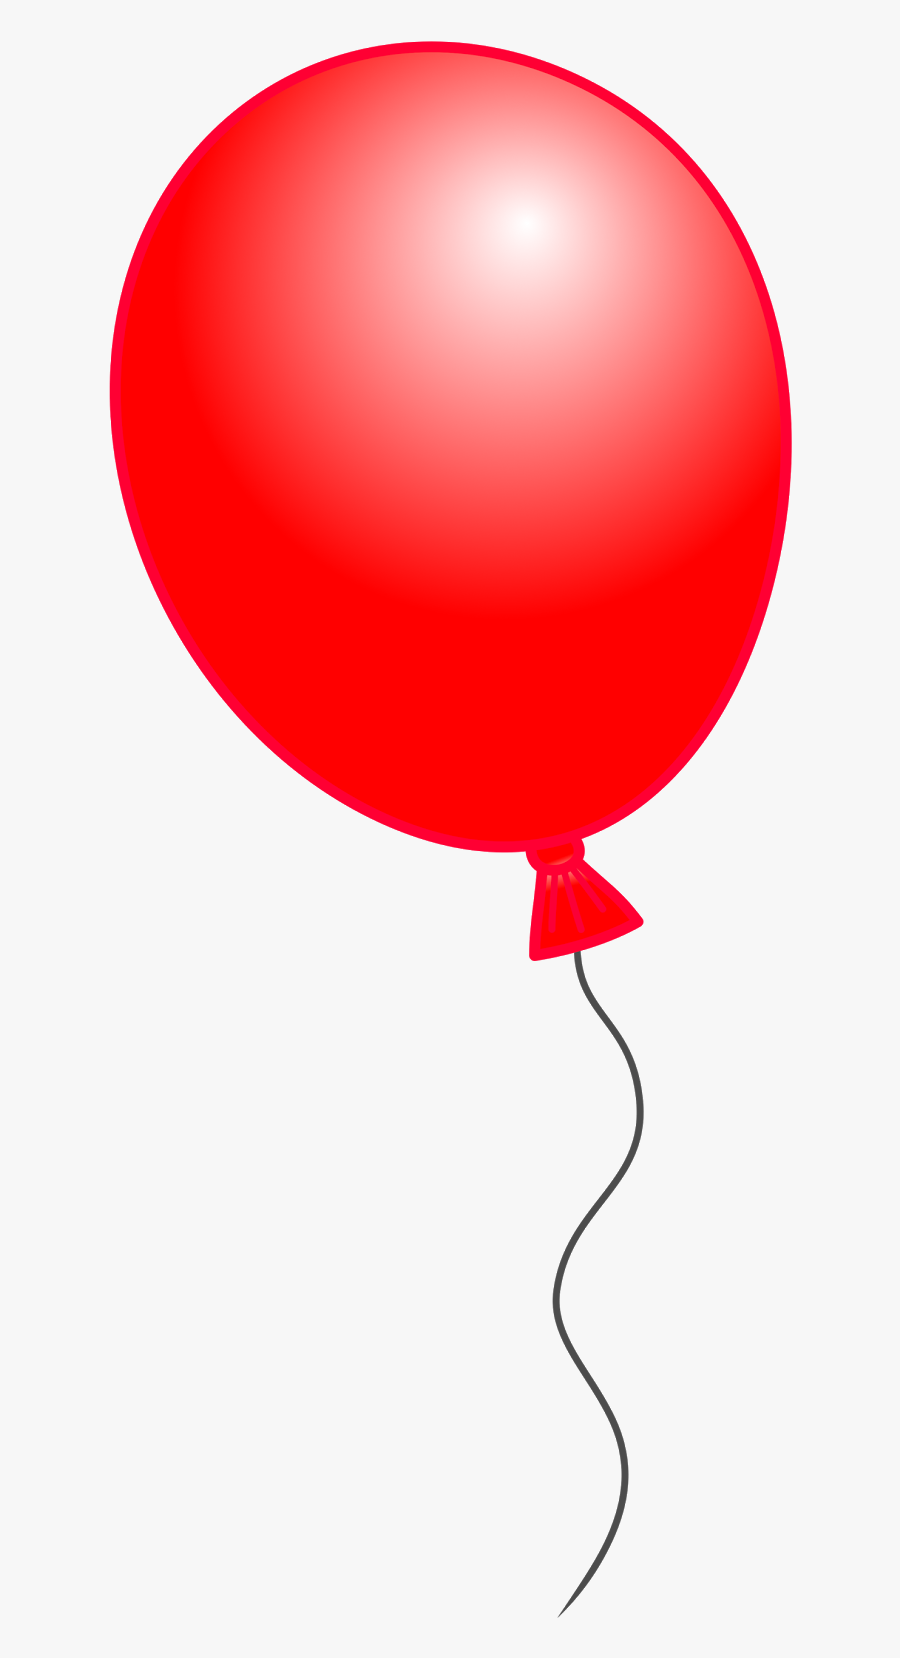 Balloon Clip Art - Balloon Clipart, Transparent Clipart